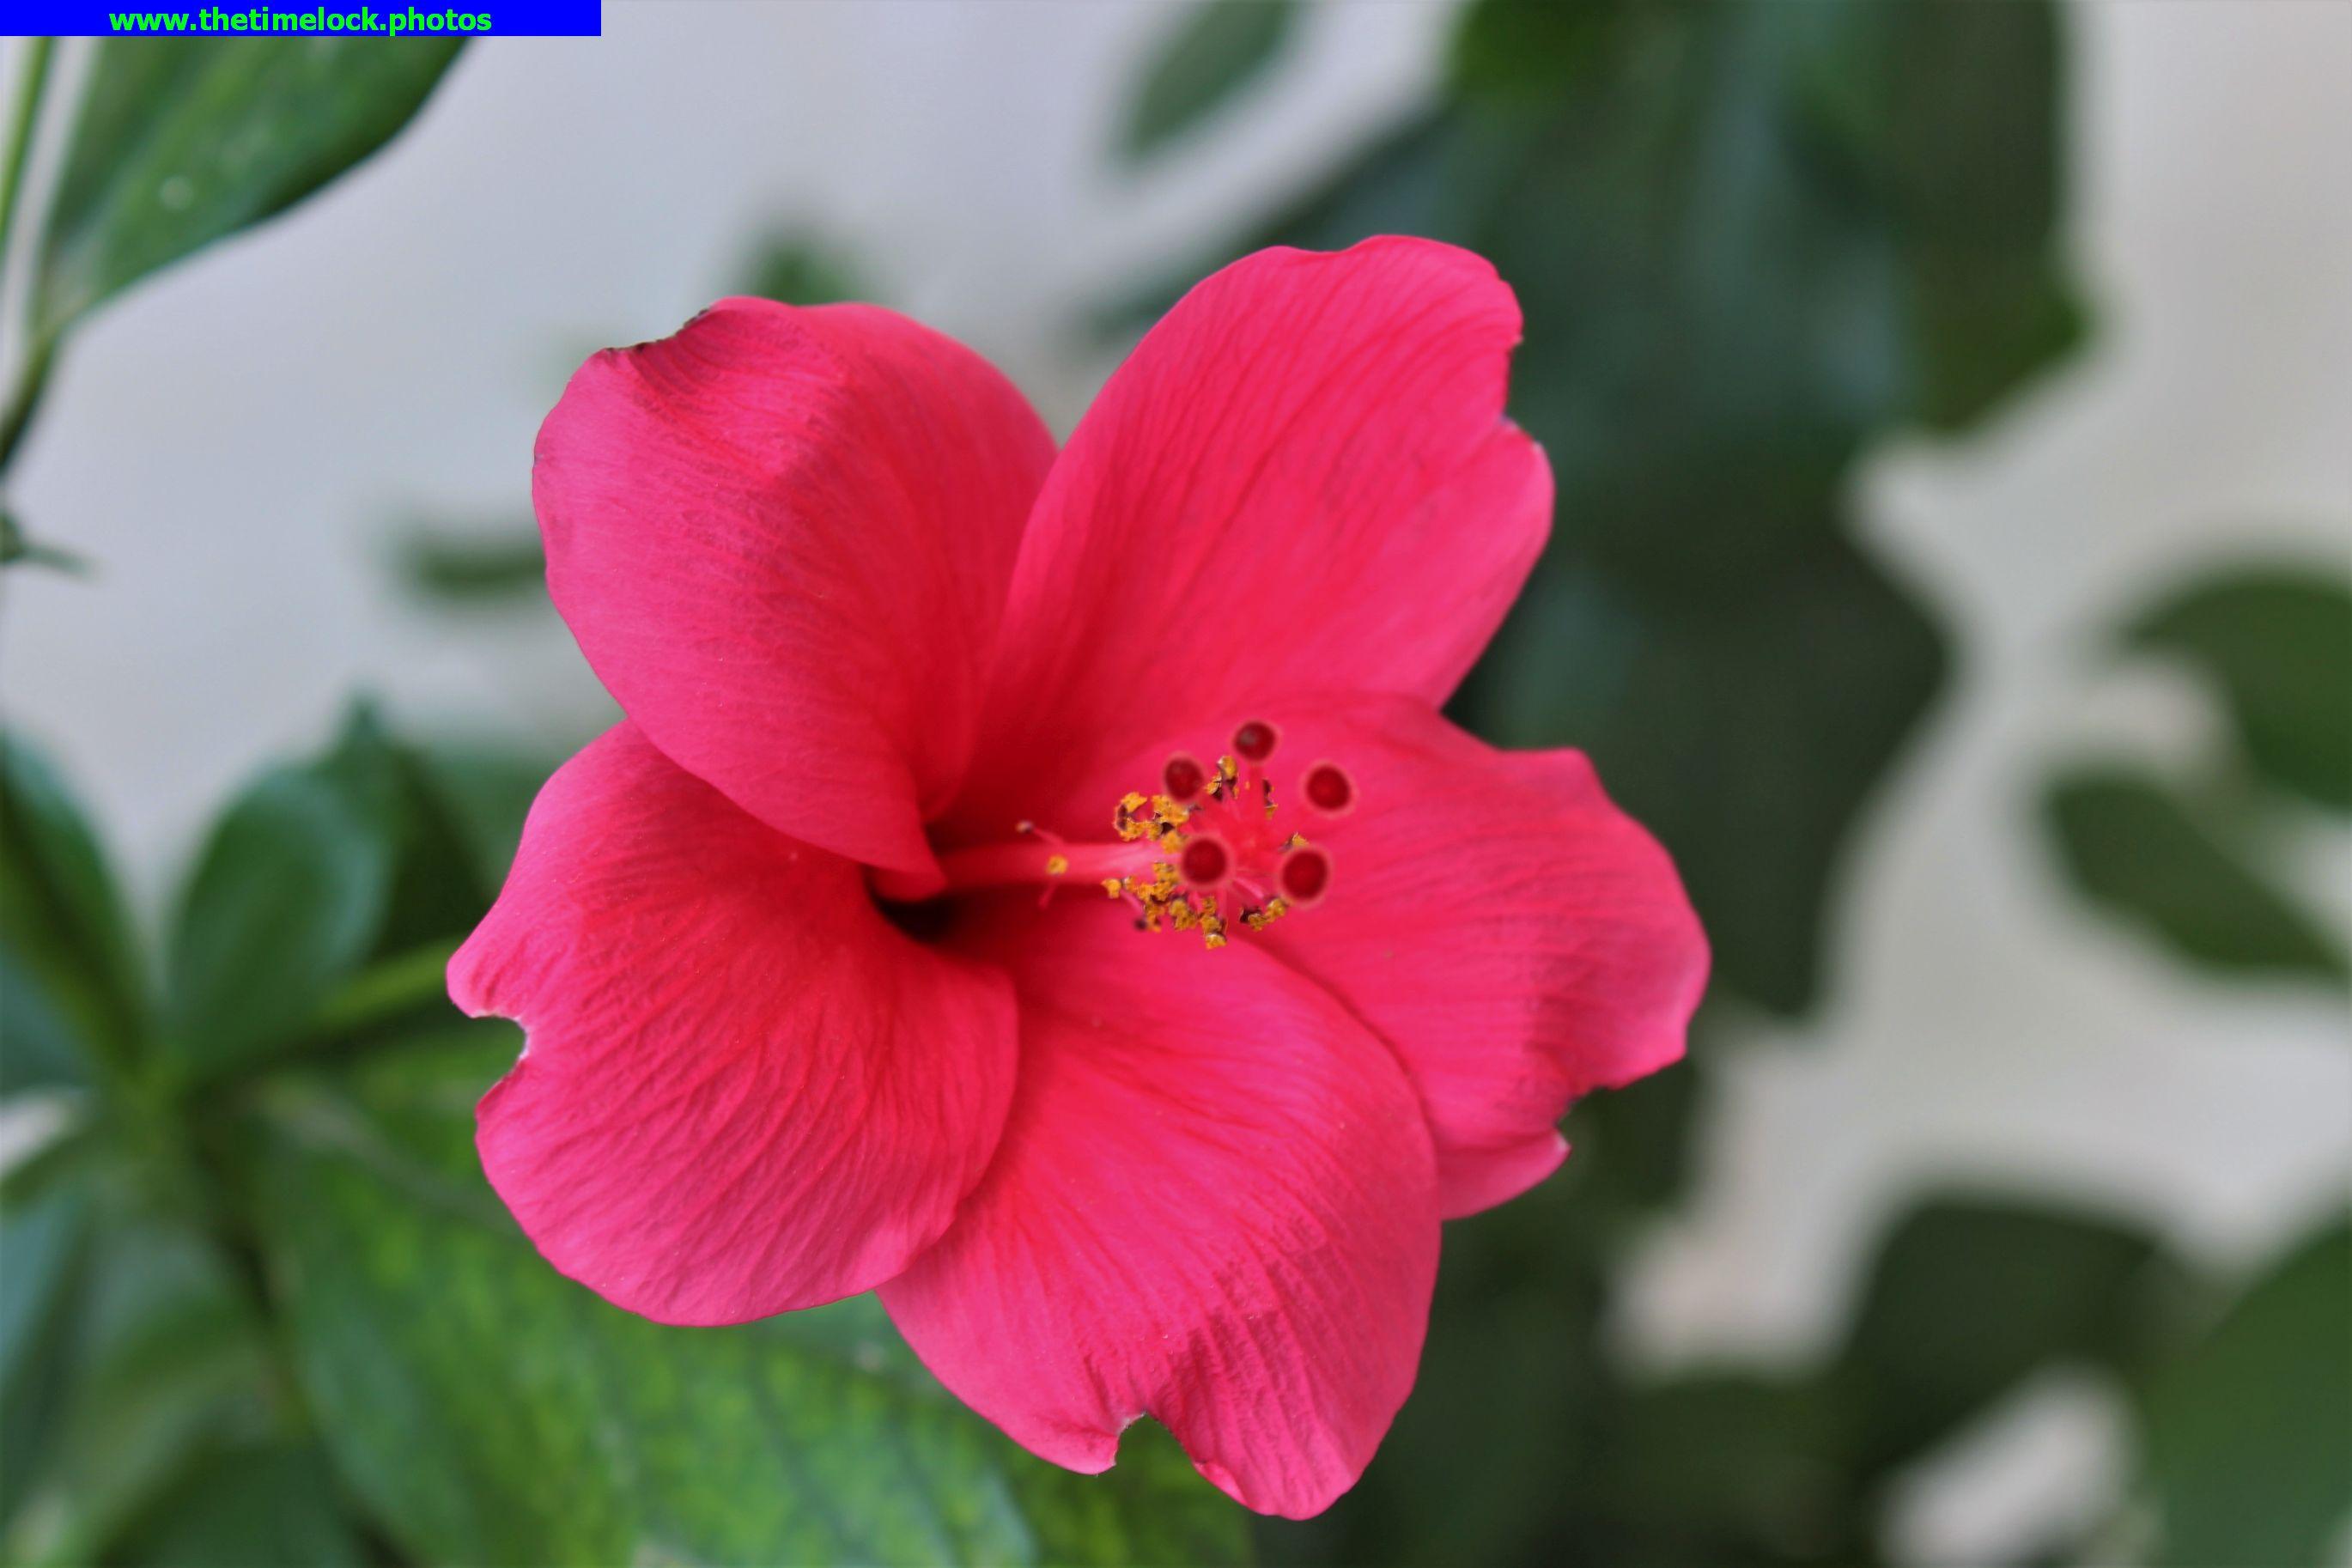 Flowers in the garden the time lock flowers in the garden izmirmasajfo